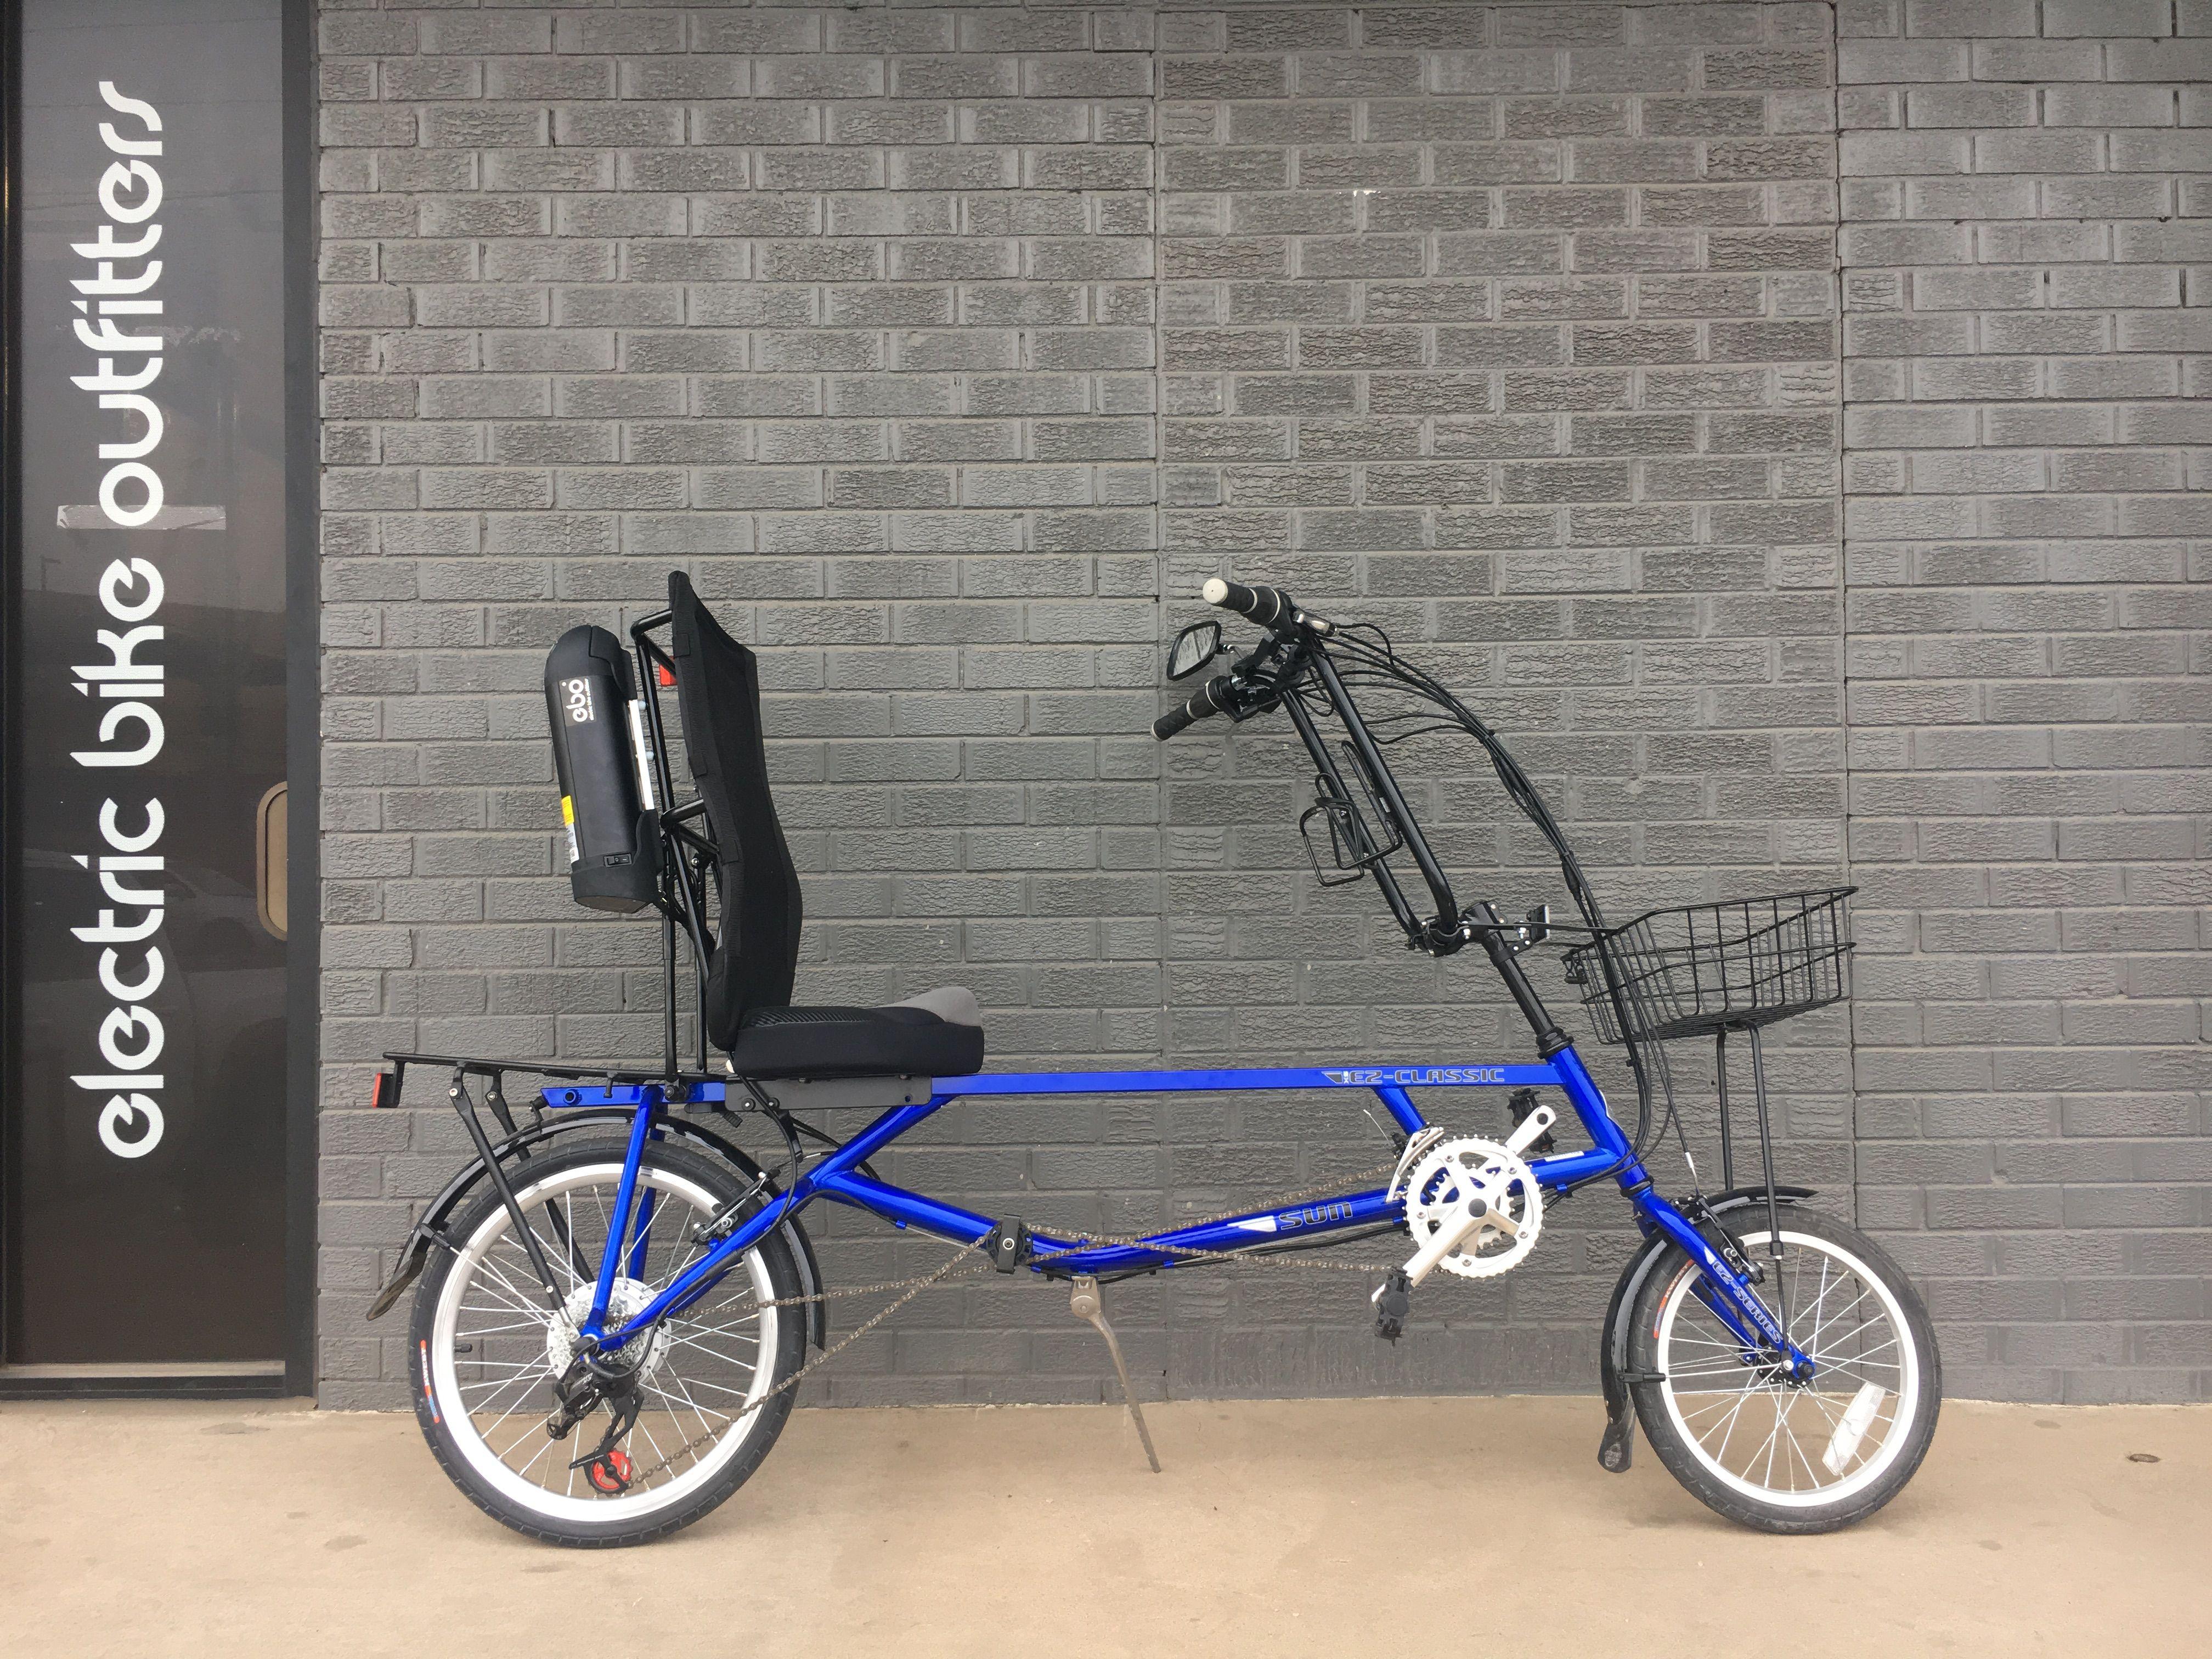 EBO Phantom electric bike conversion kit installed on a